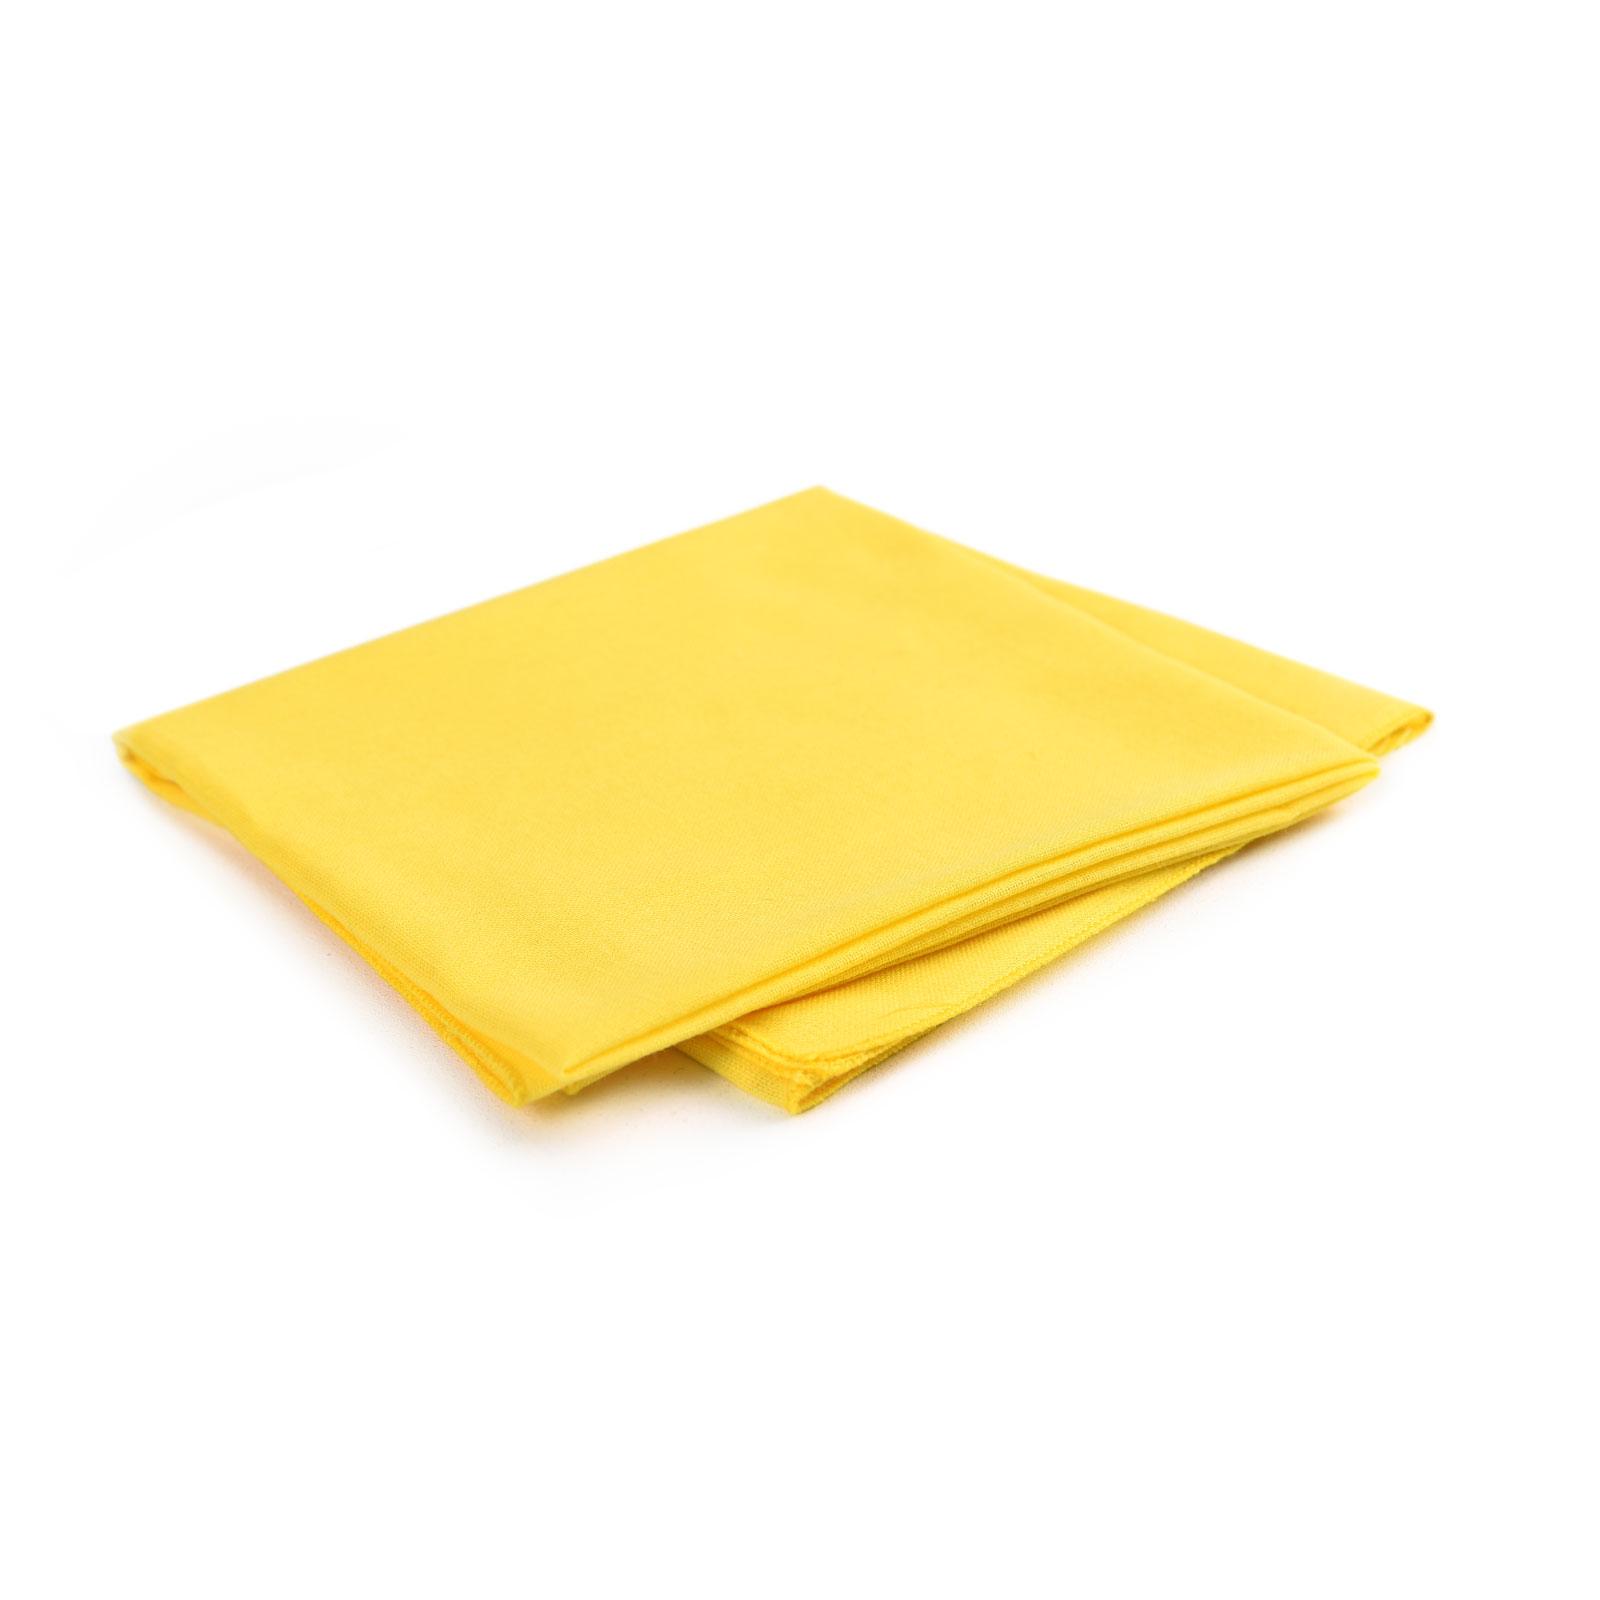 AT-04301-F16-P-bandana-jaune